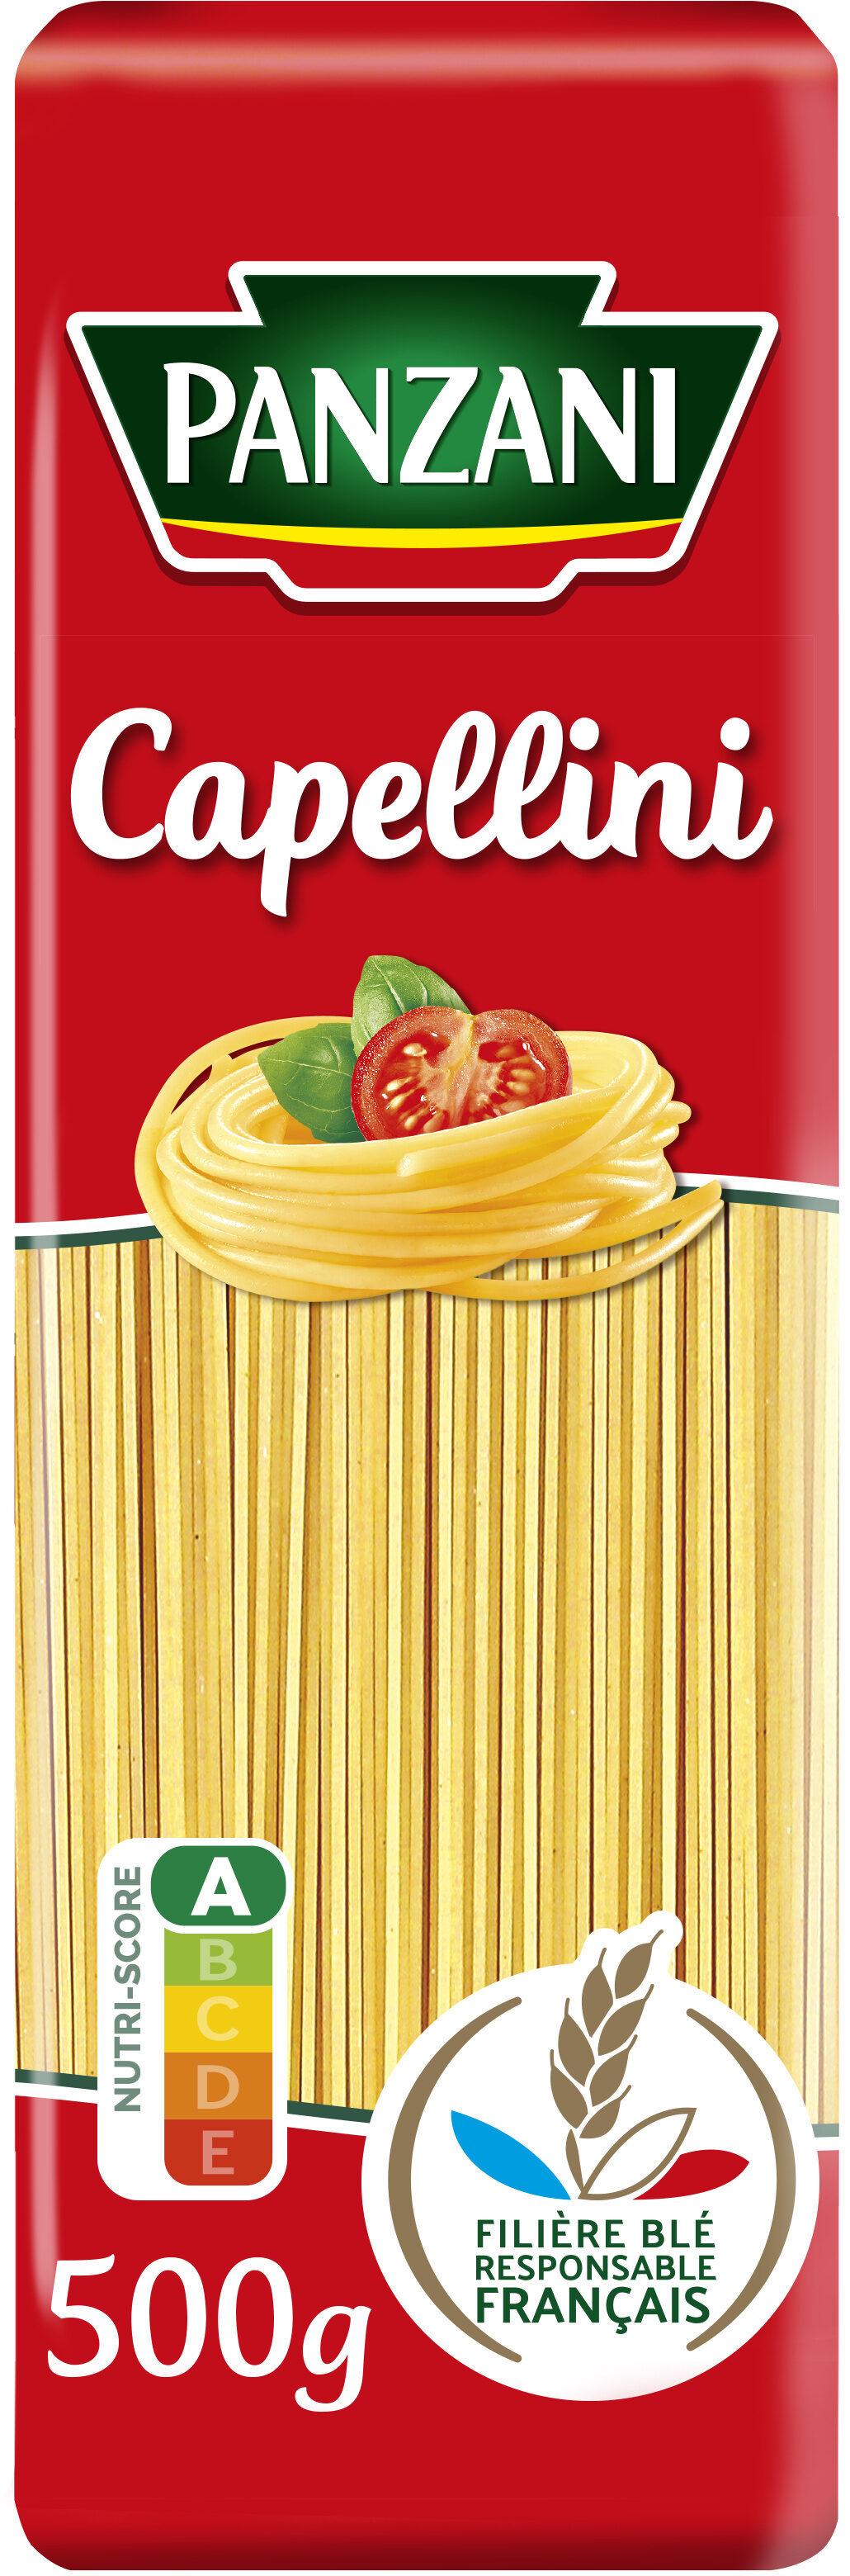 Panzani capellini - Product - fr